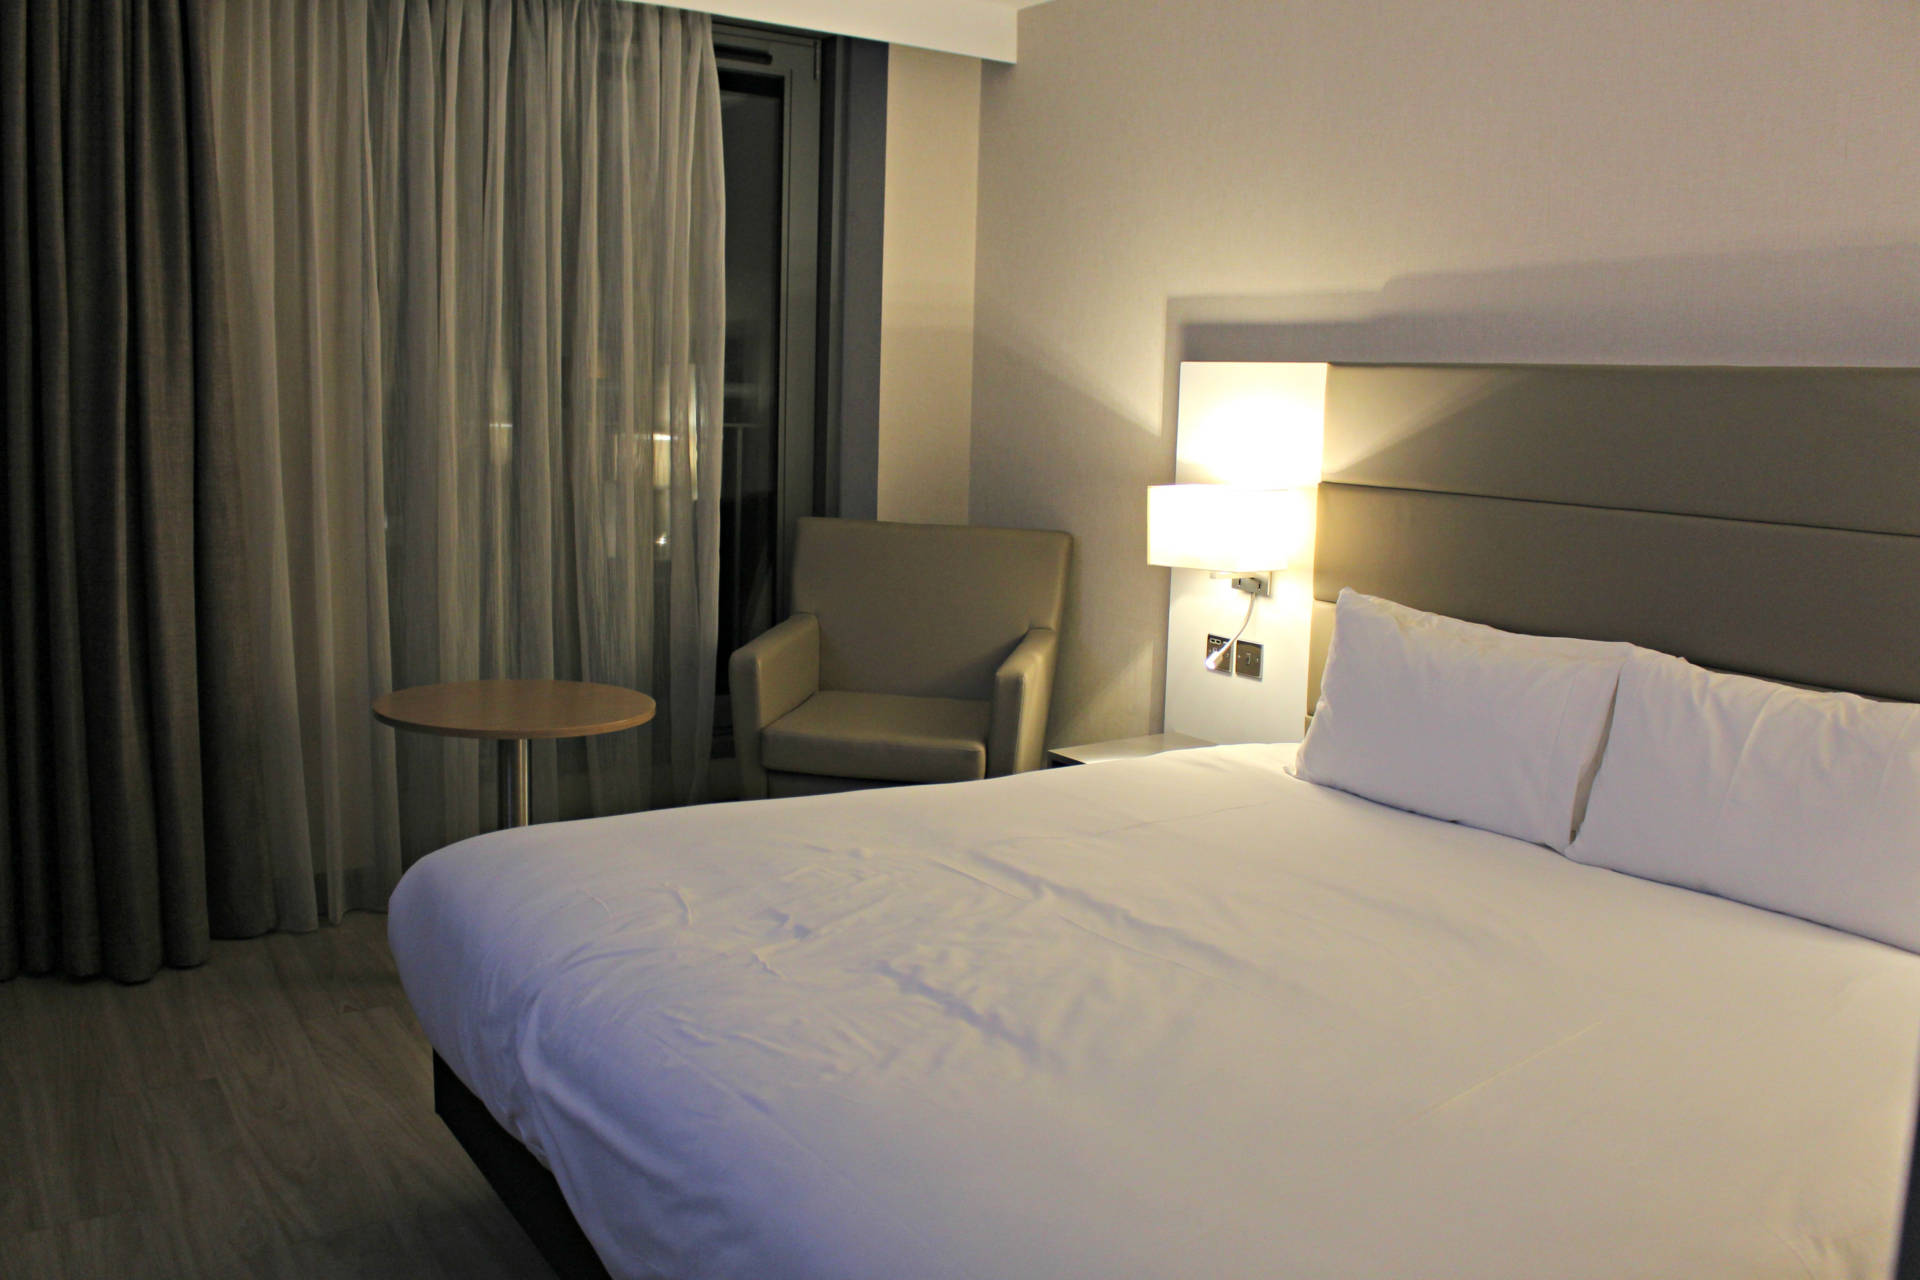 AC Hotel in Birmingham